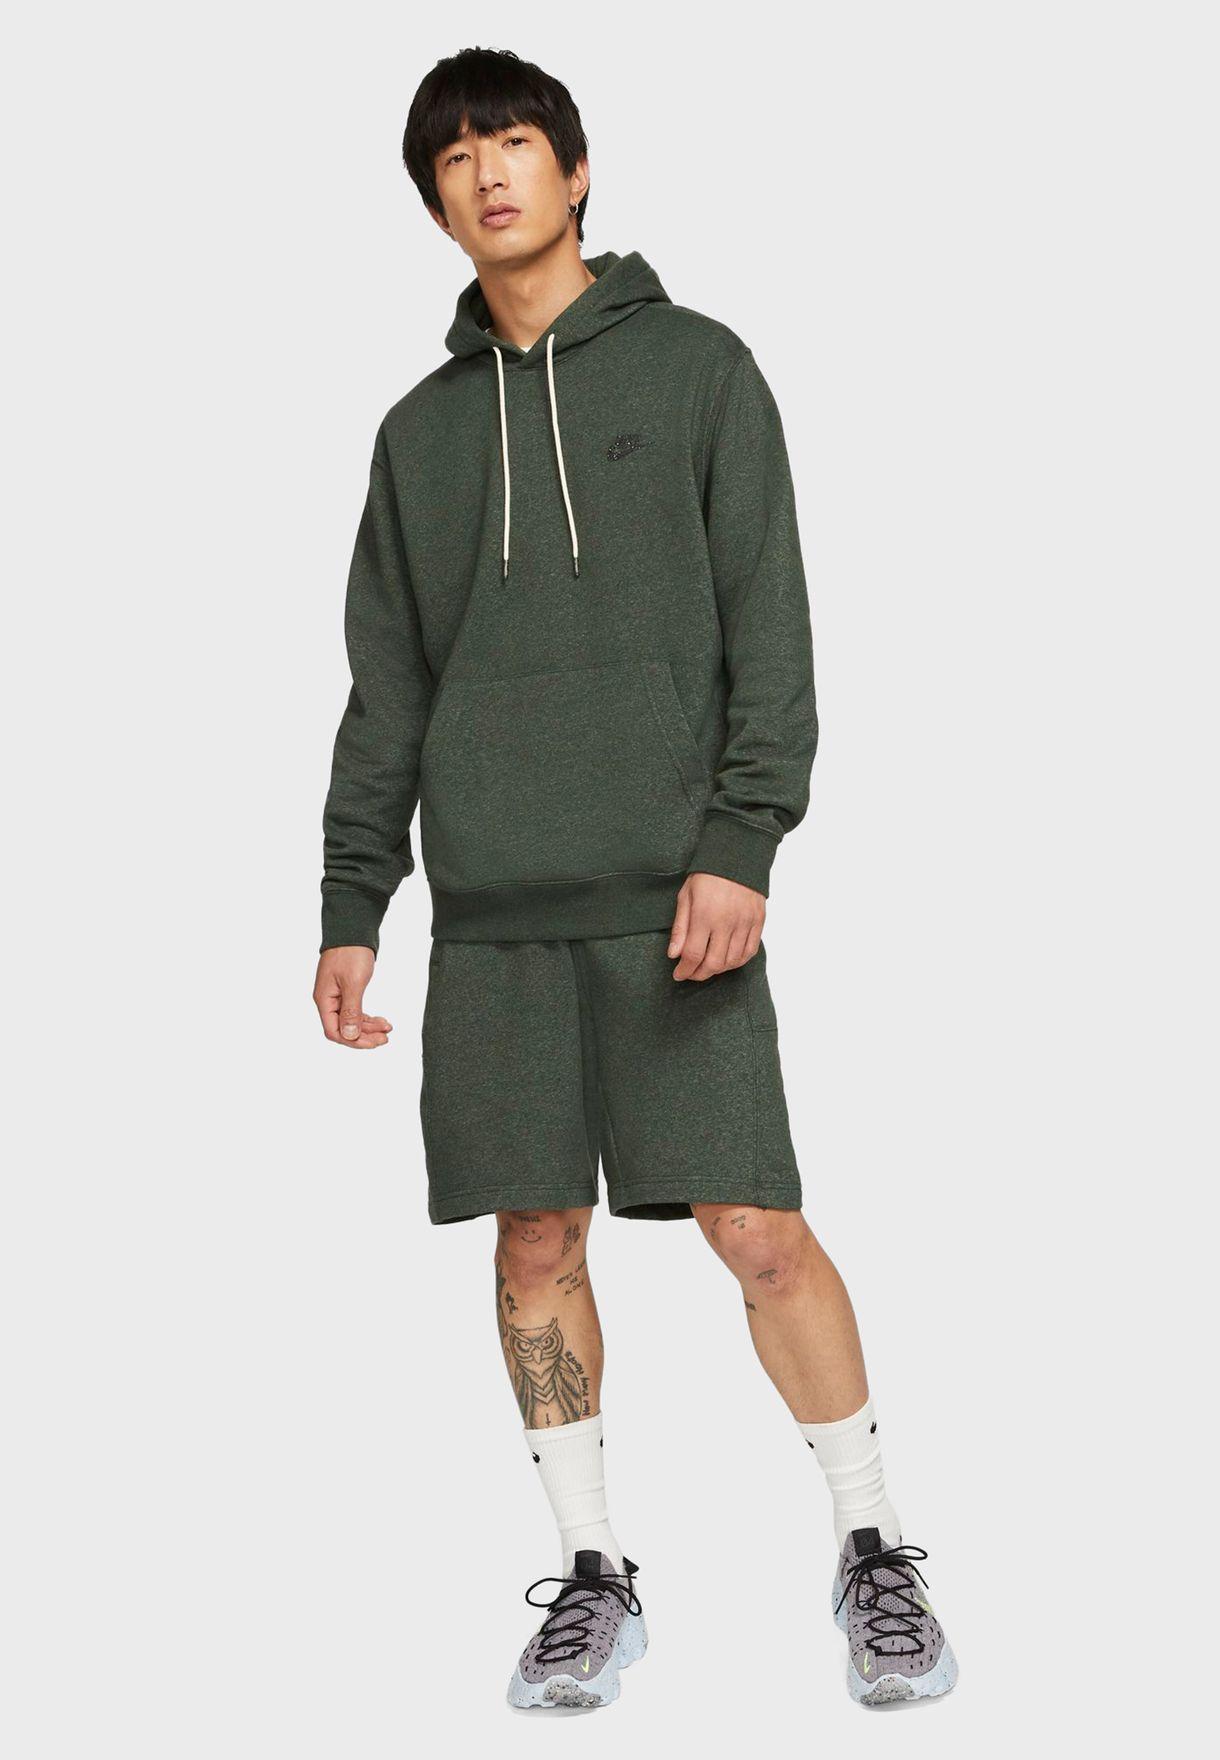 NSW Revival Shorts